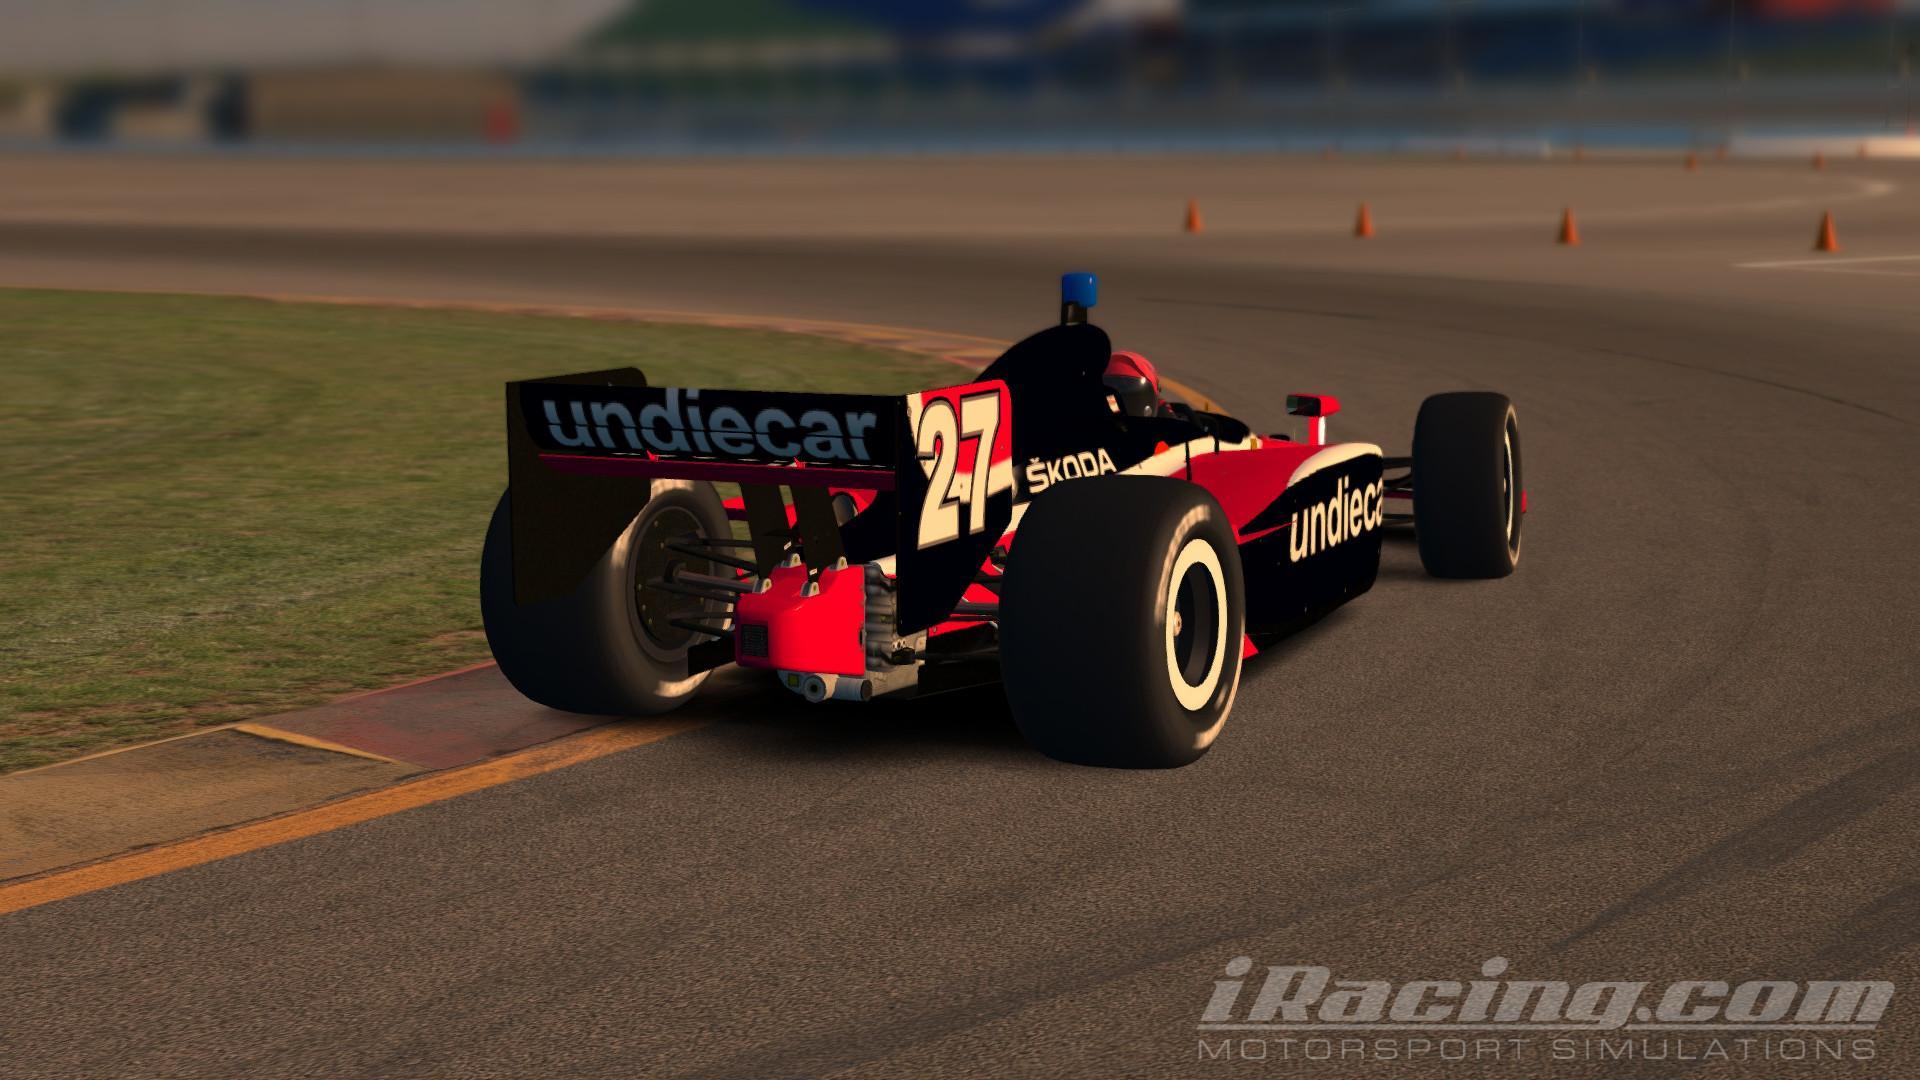 Preview of Undiecar IR05 alternate by Ryan Hellyer